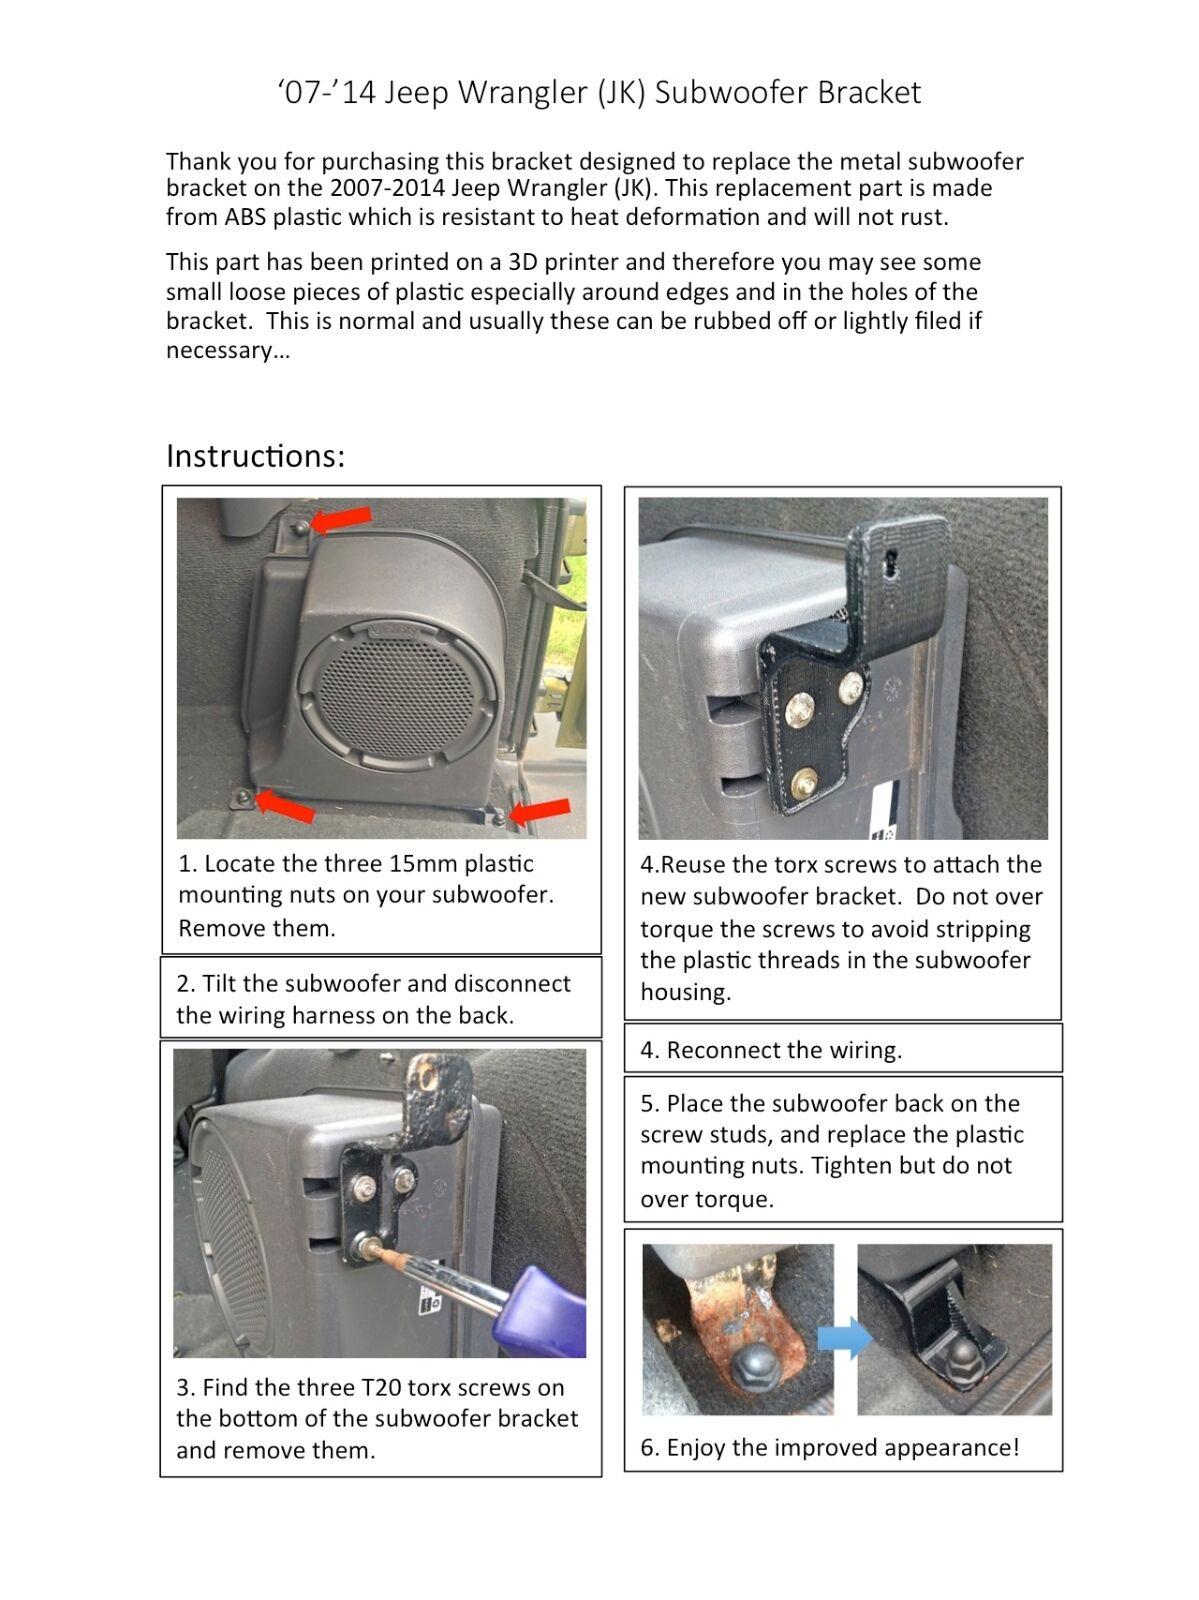 Jeep Wrangler Jk Subwoofer Bracket 2007 2010 Plastic Oem Replacement 2014 Wiring Harness Ebay